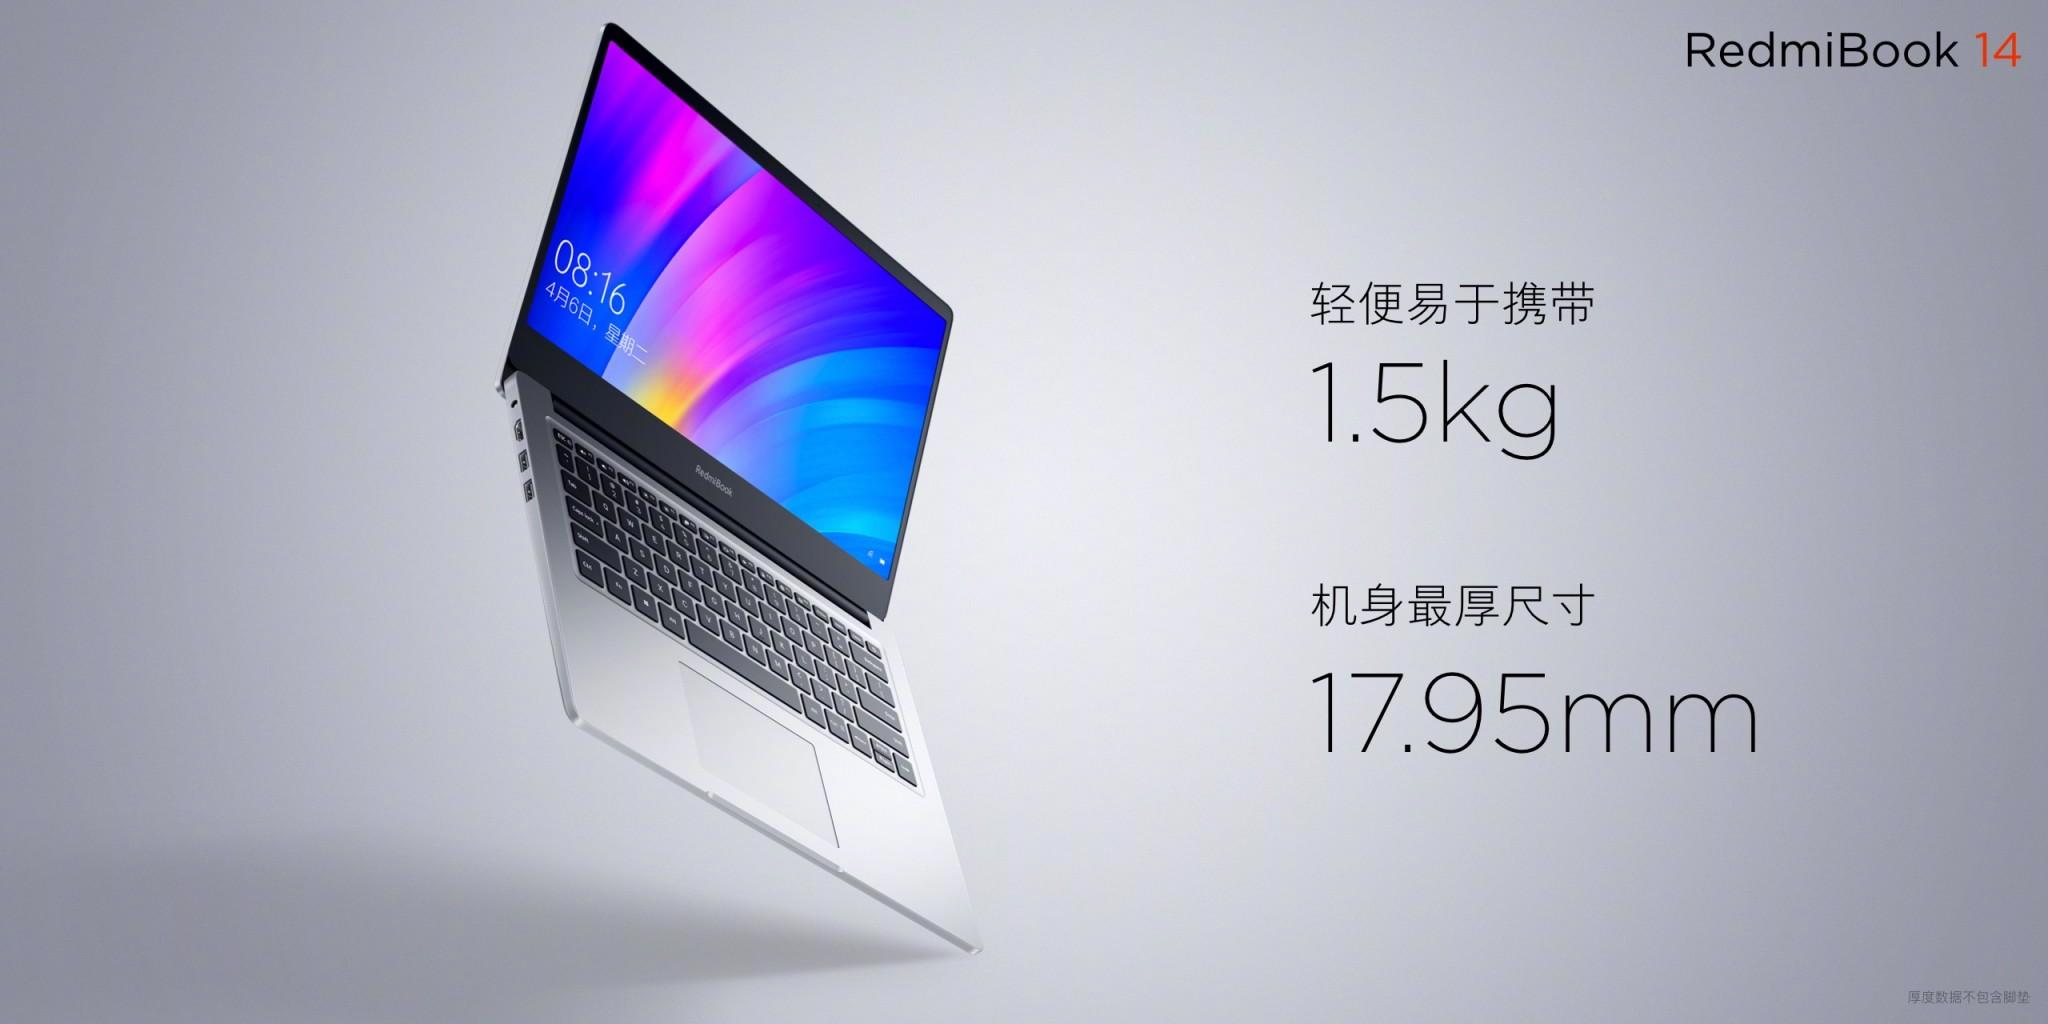 A new RedmiBook 14 with Intel Core i7 10th Gen processor